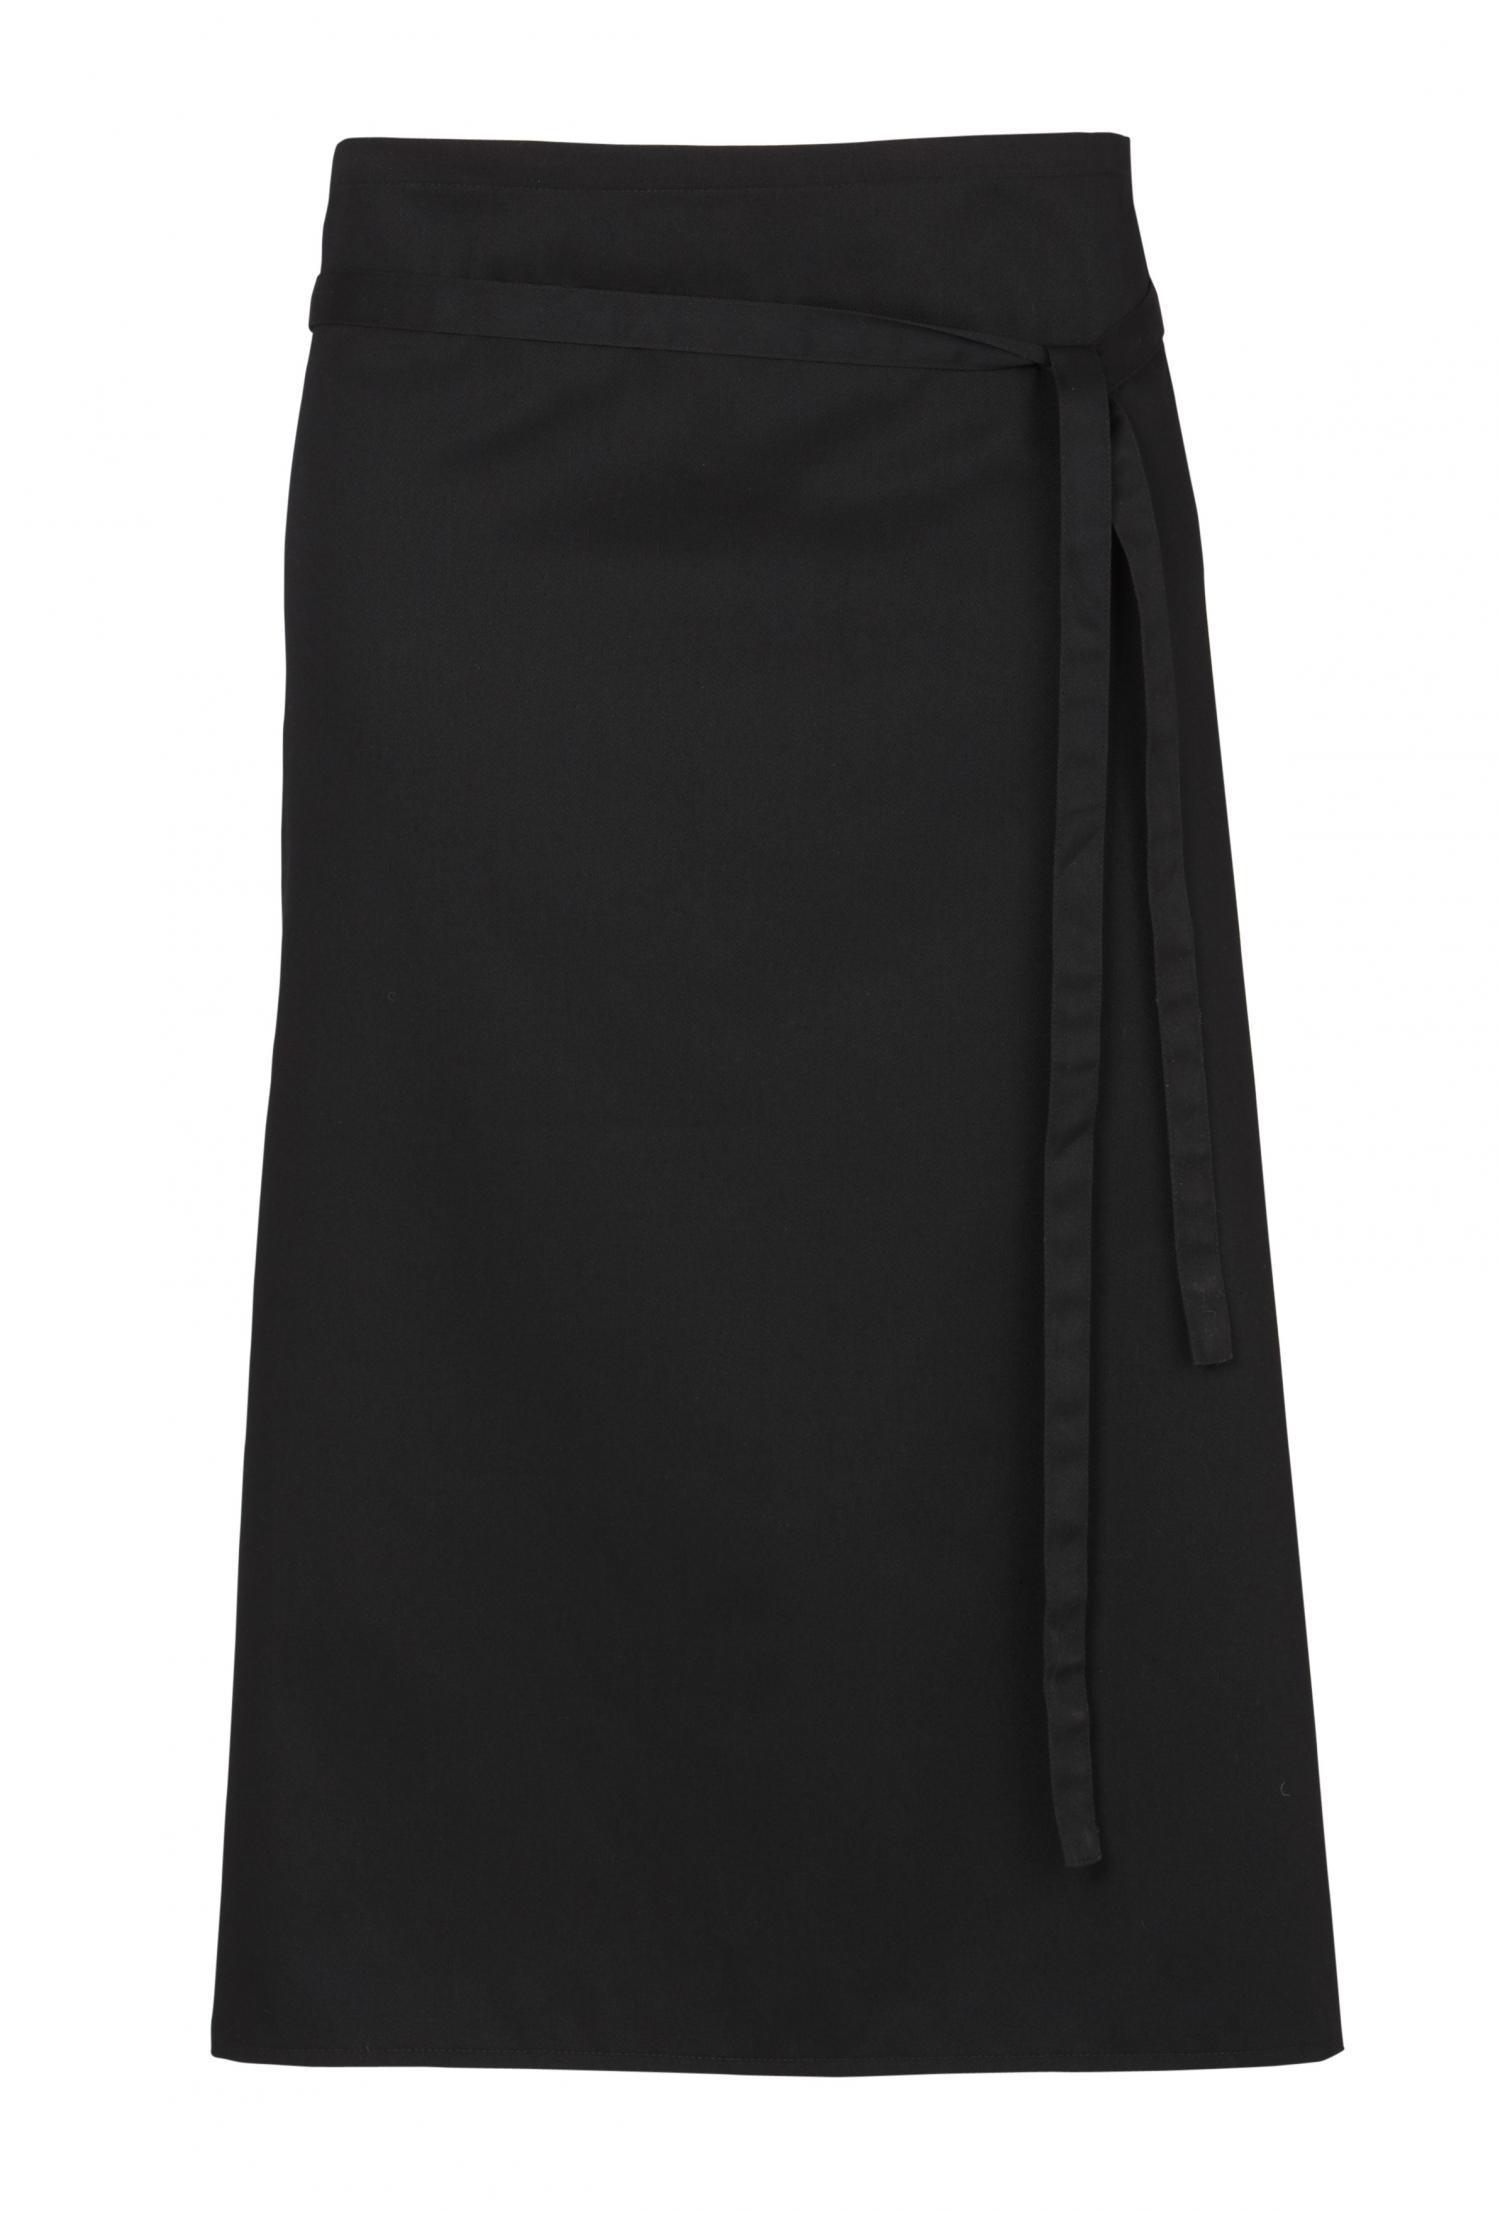 White bistro apron - Black